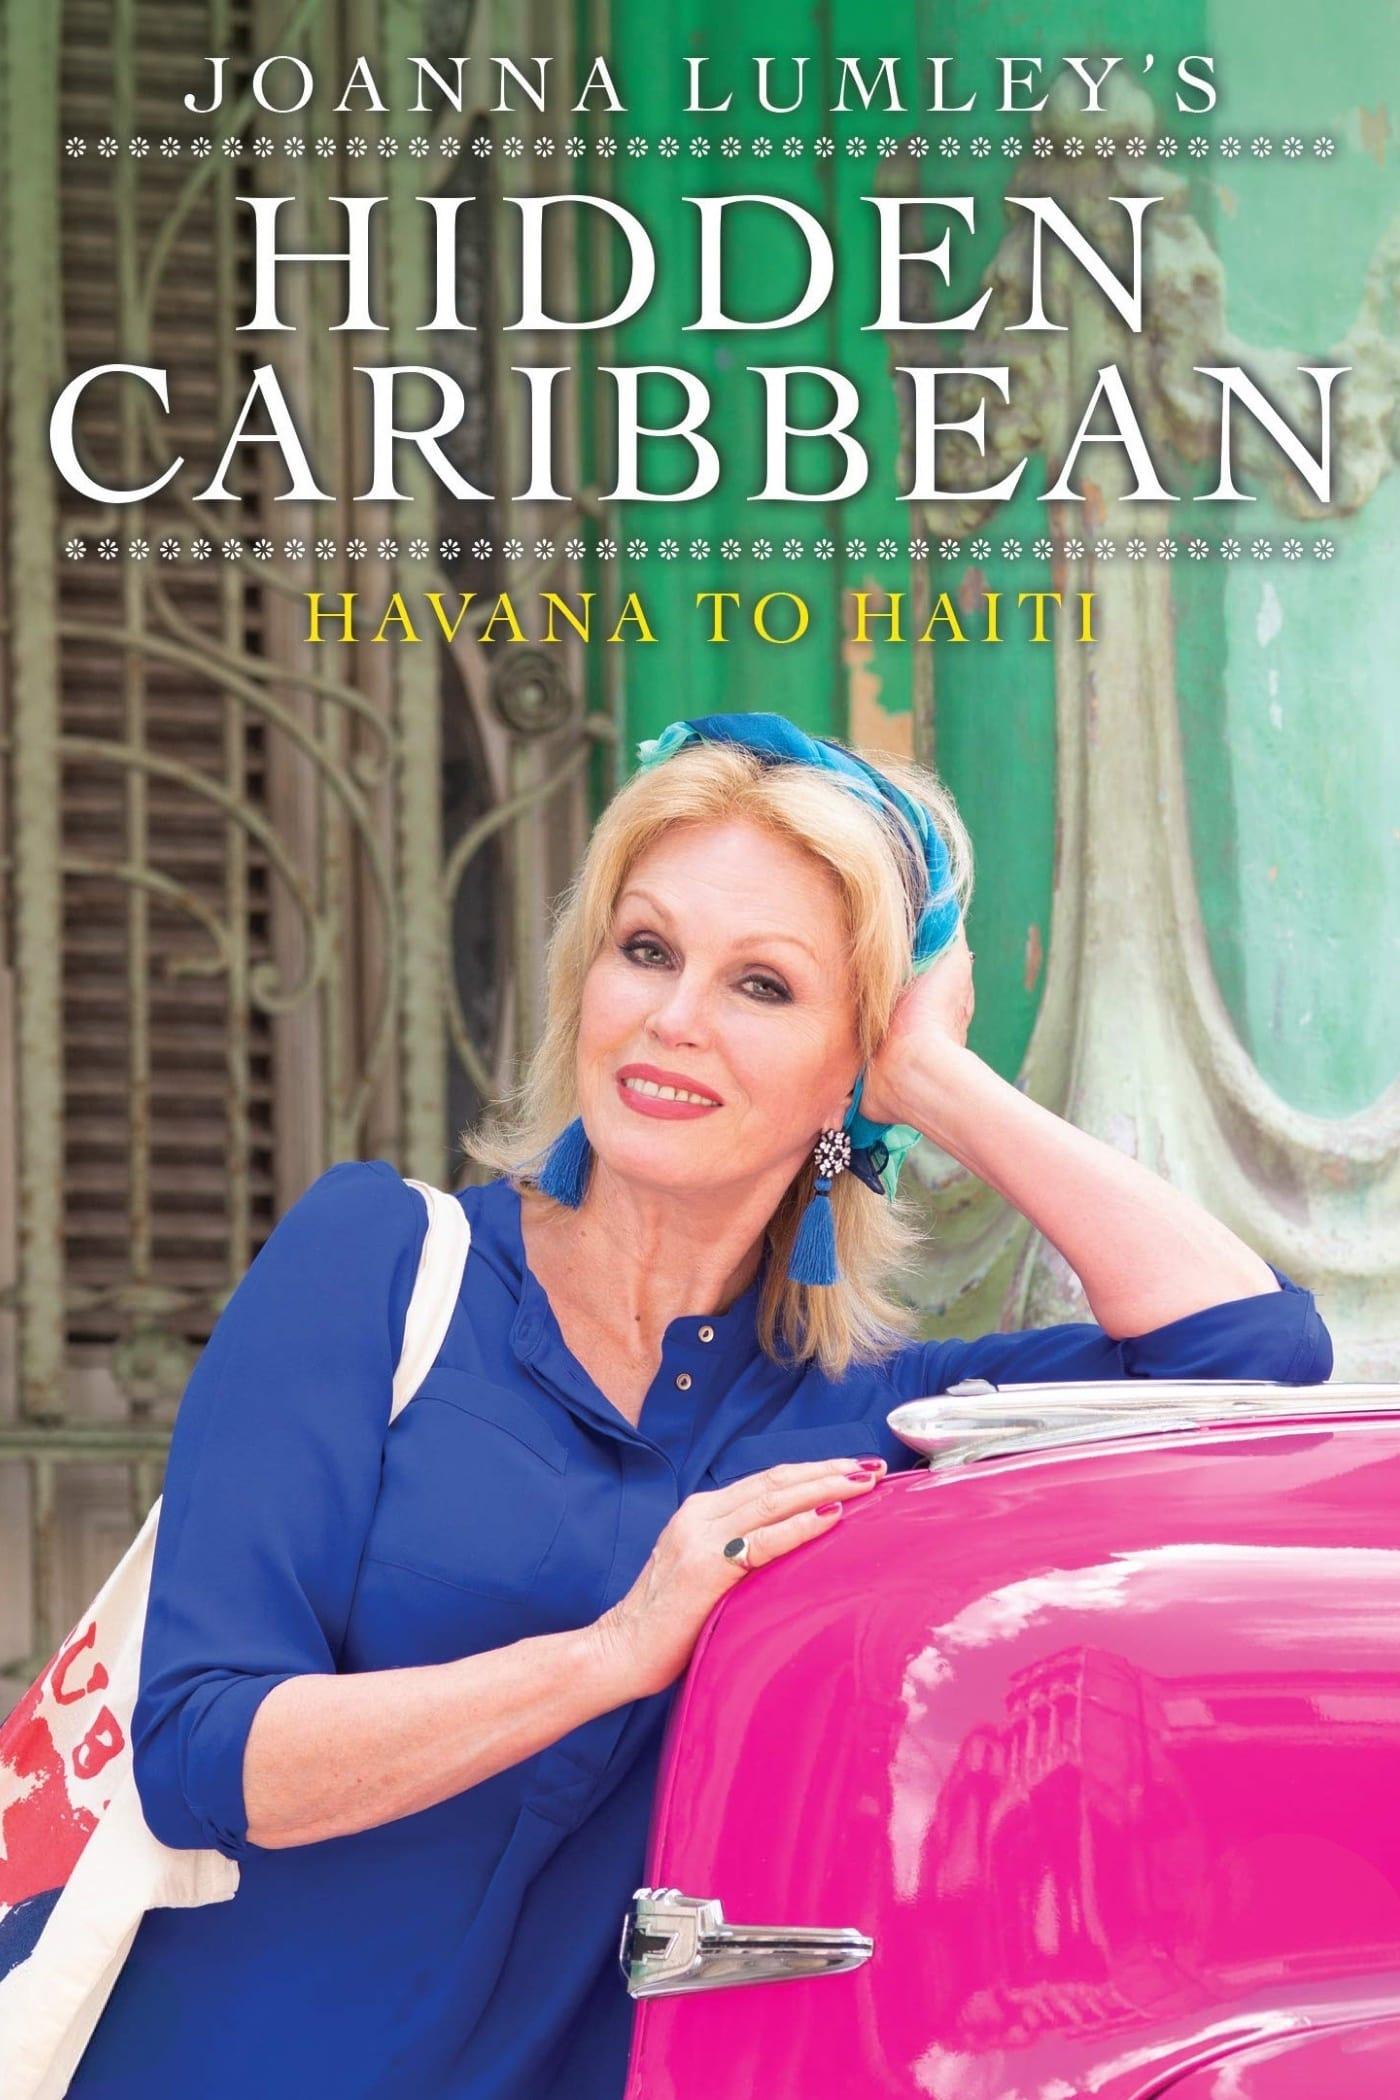 Joanna Lumley's Hidden Caribbean: Havana to Haiti TV Shows About Sea